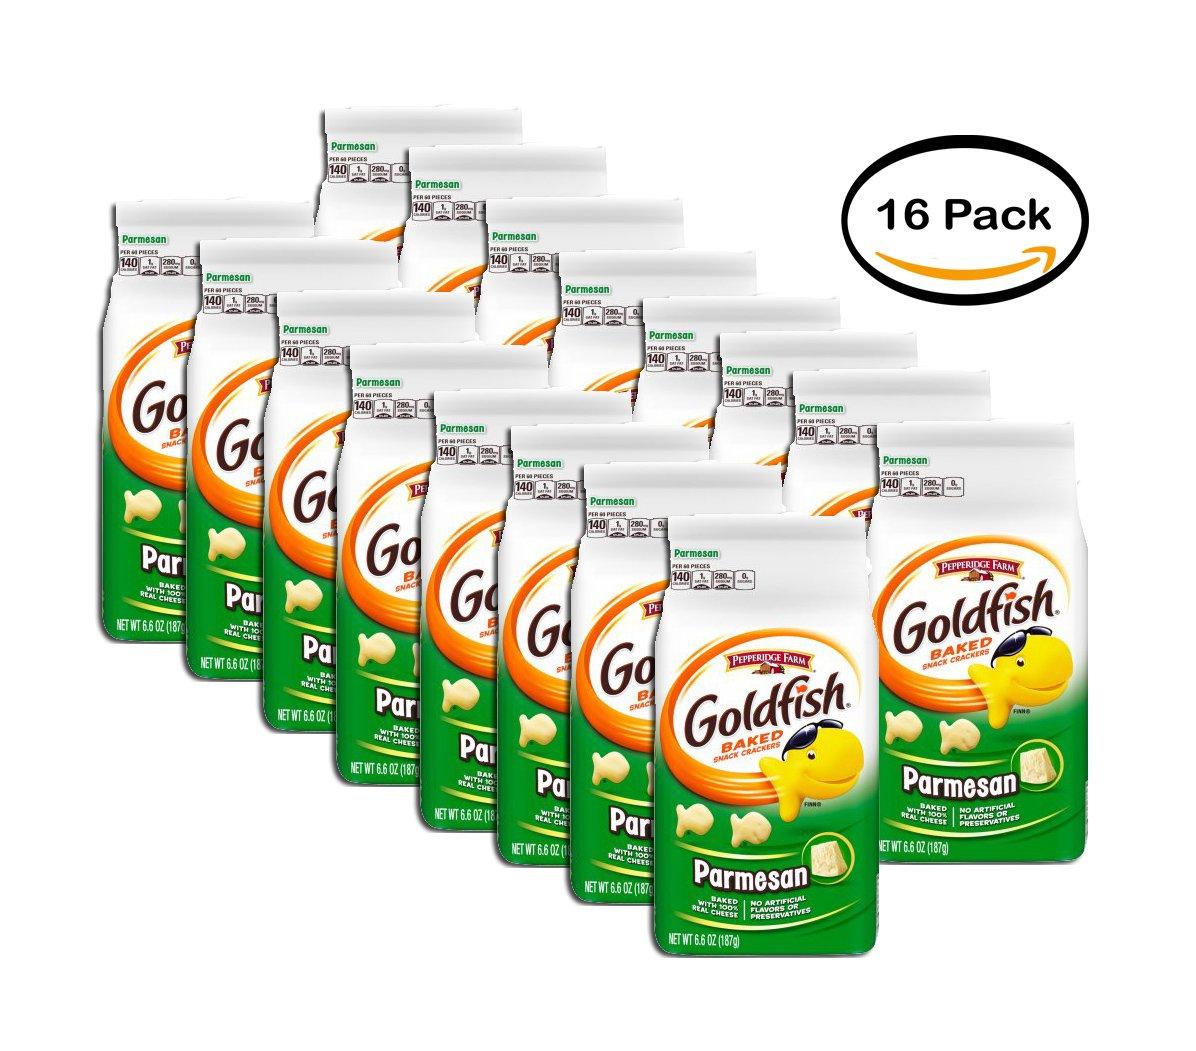 PACK OF 16 - Pepperidge Farm Goldfish Parmesan Baked Snack Crackers 6.6 oz. Bag